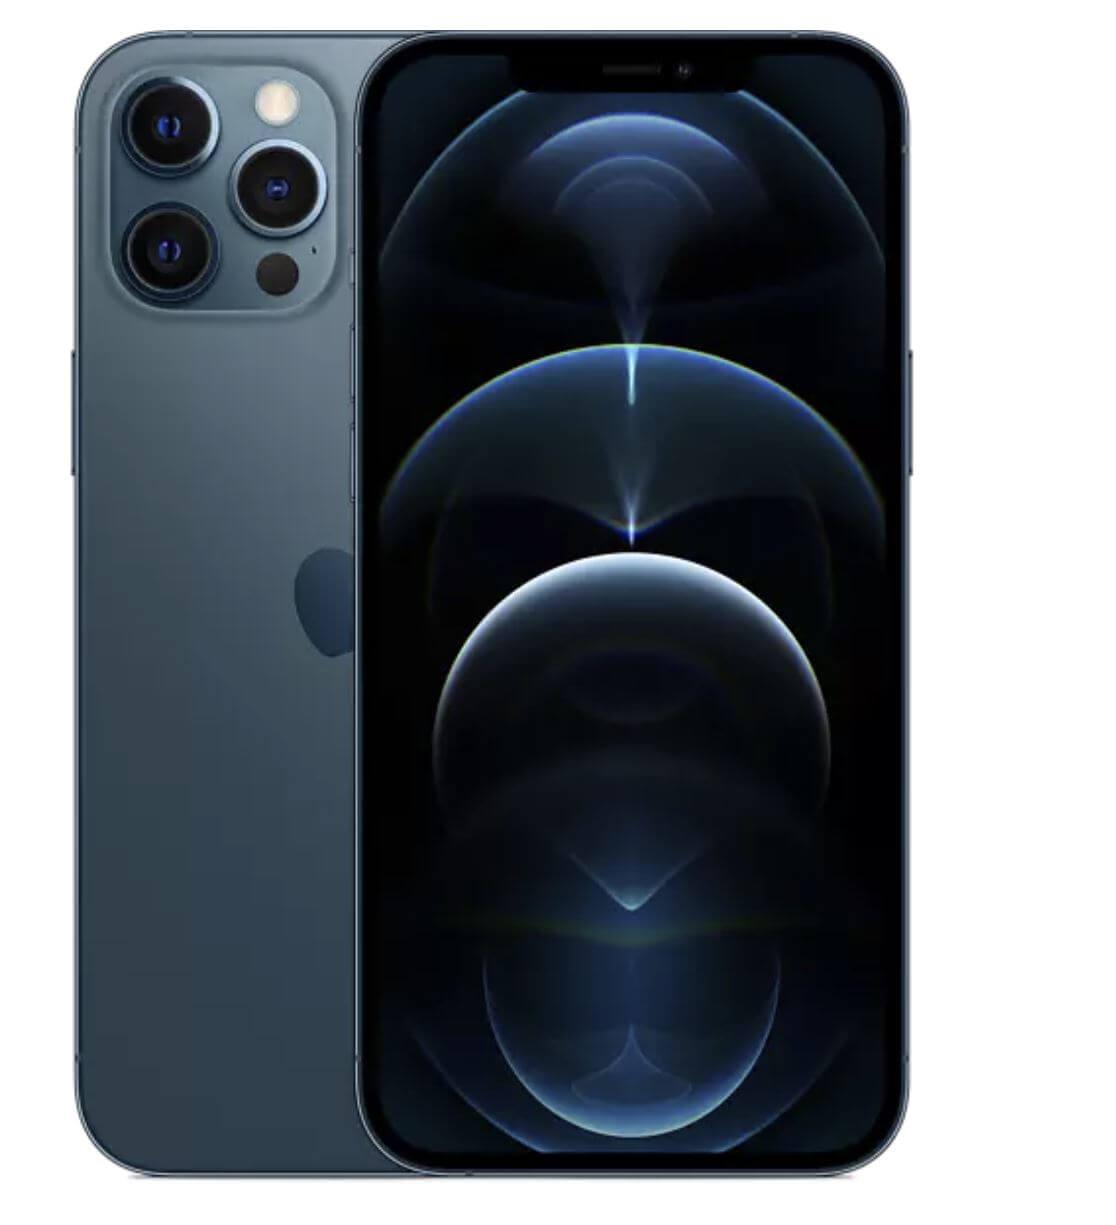 iPhone 12 64 GB Black Friday